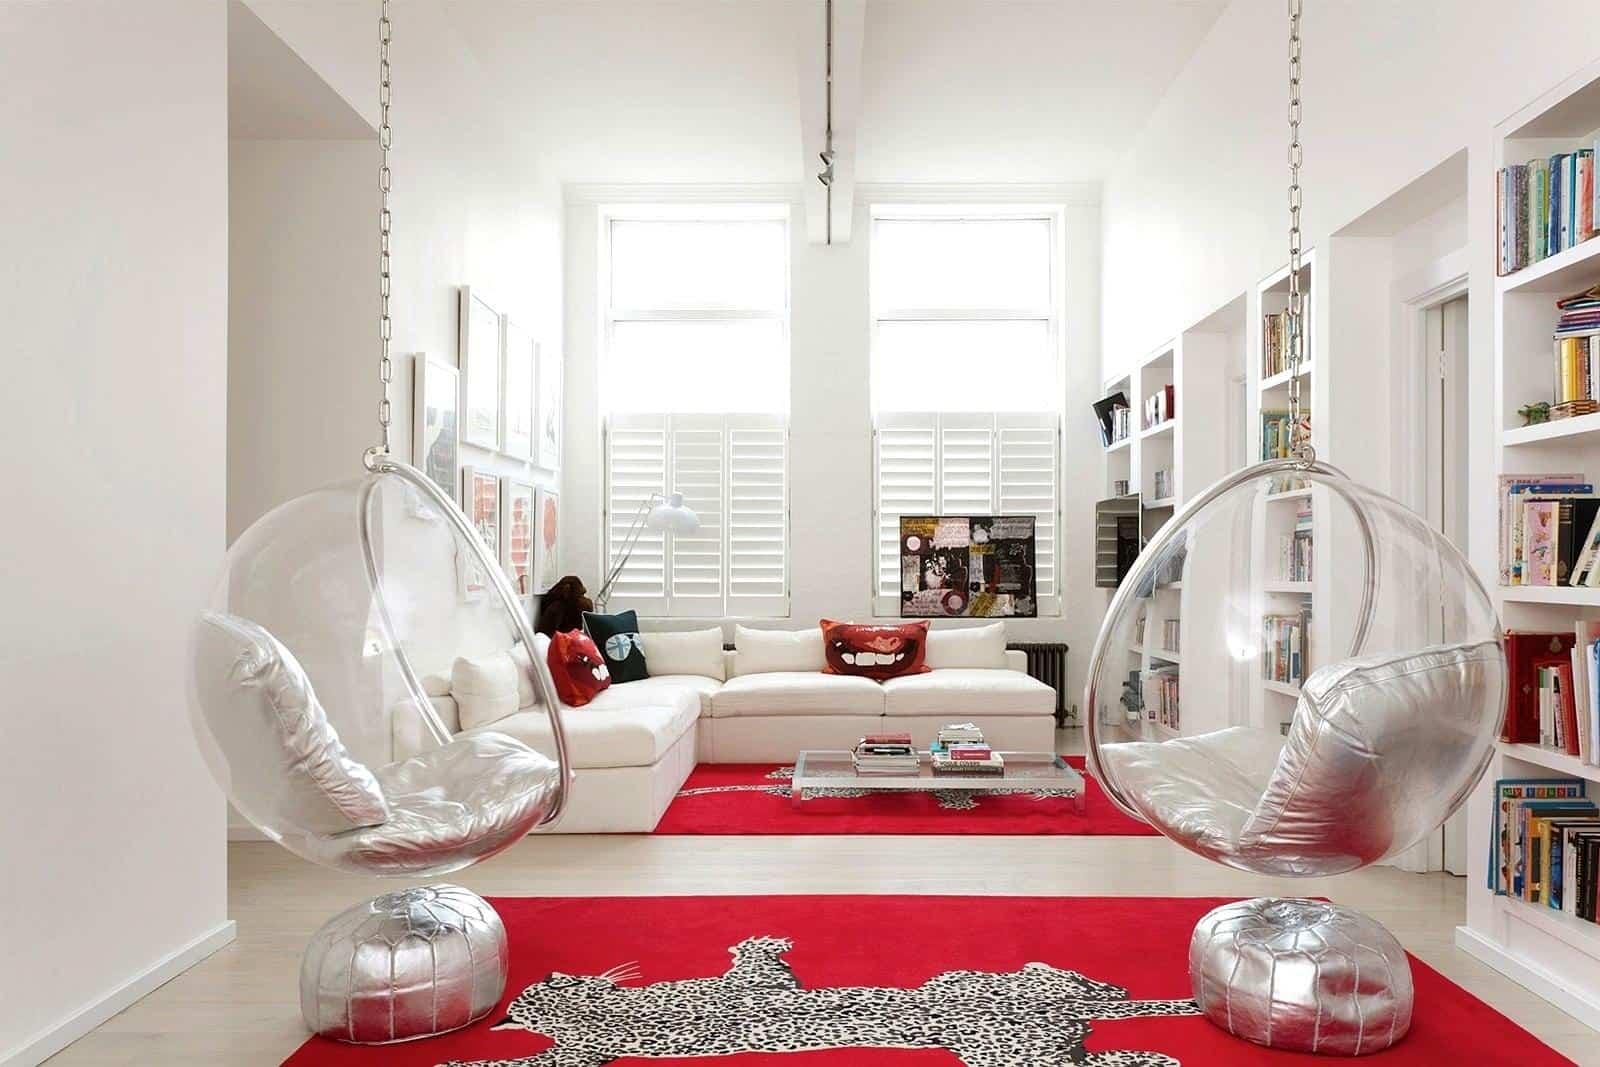 rounded decor